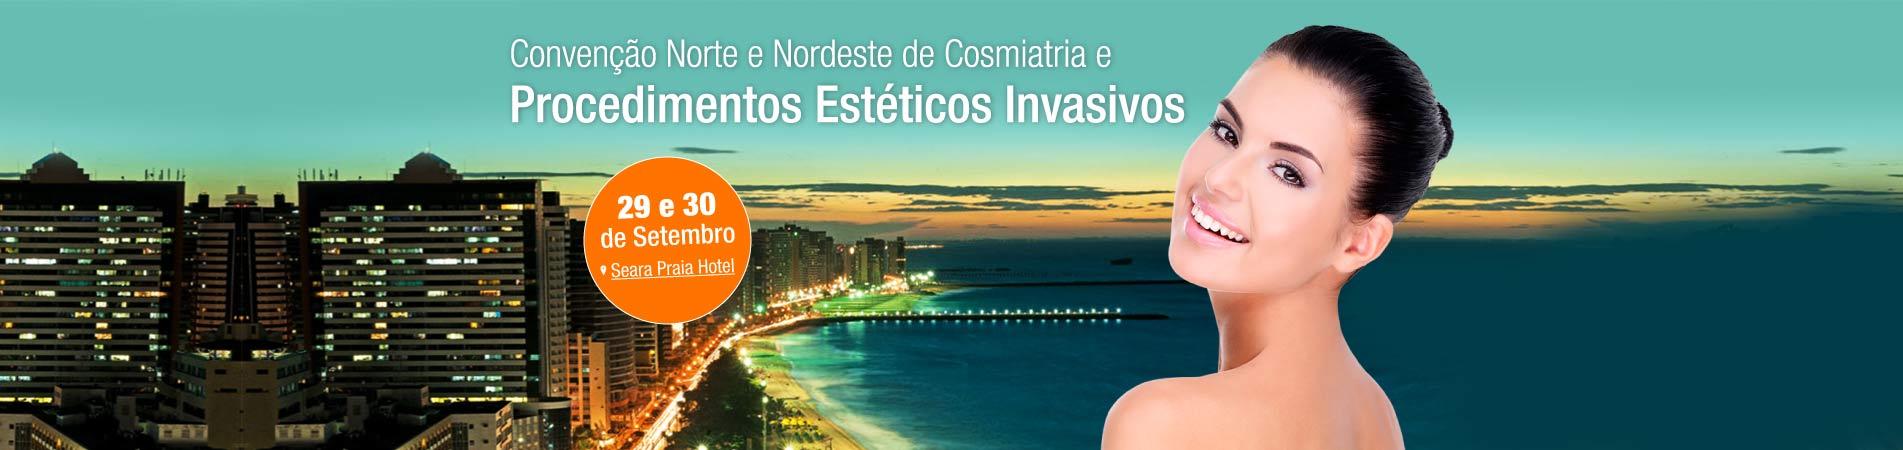 naja-turismo-banner-evento-cosmiatria